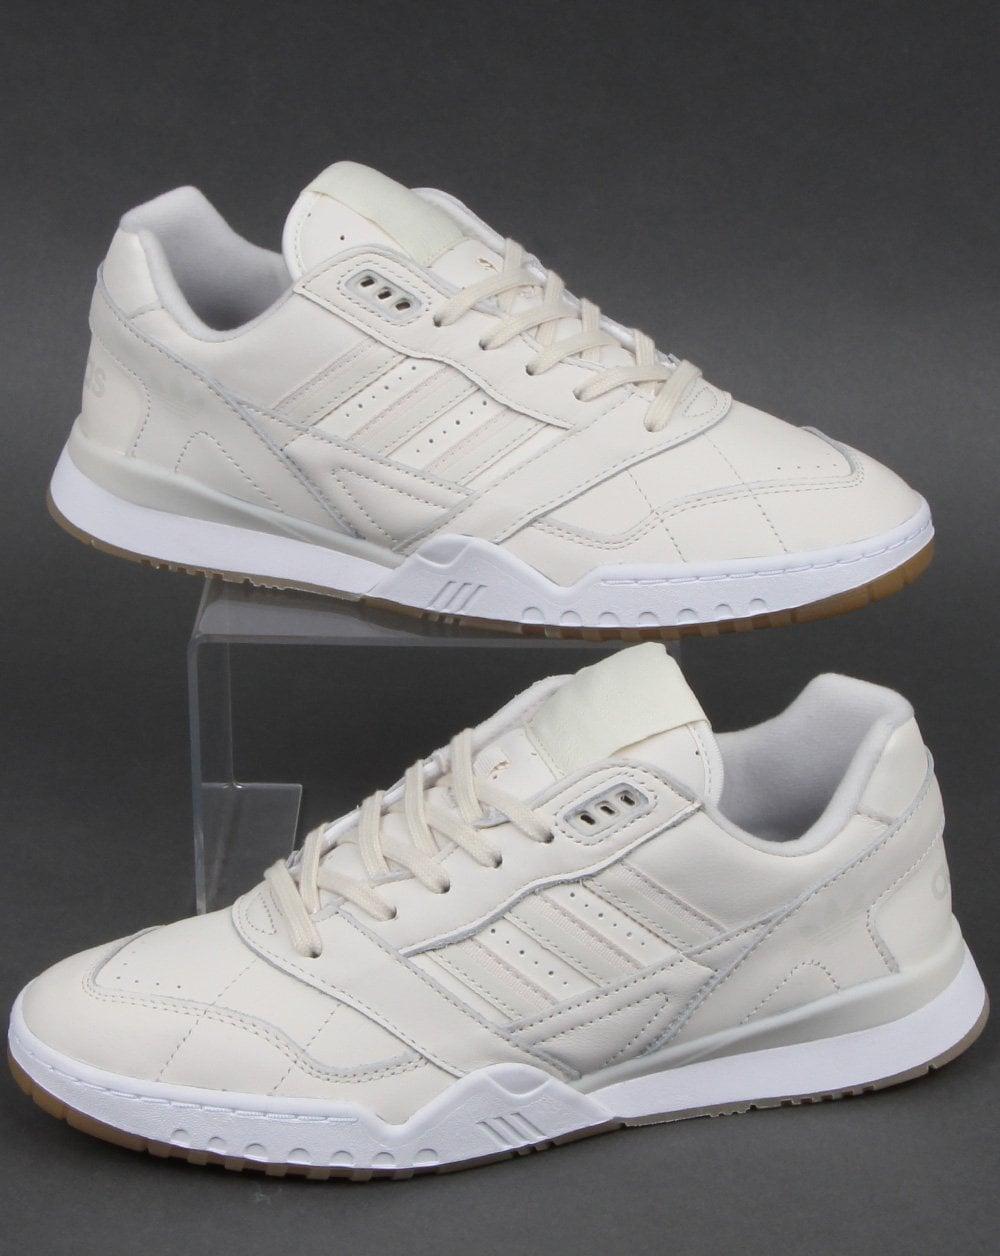 Adidas A.R. Trainer Chalk White